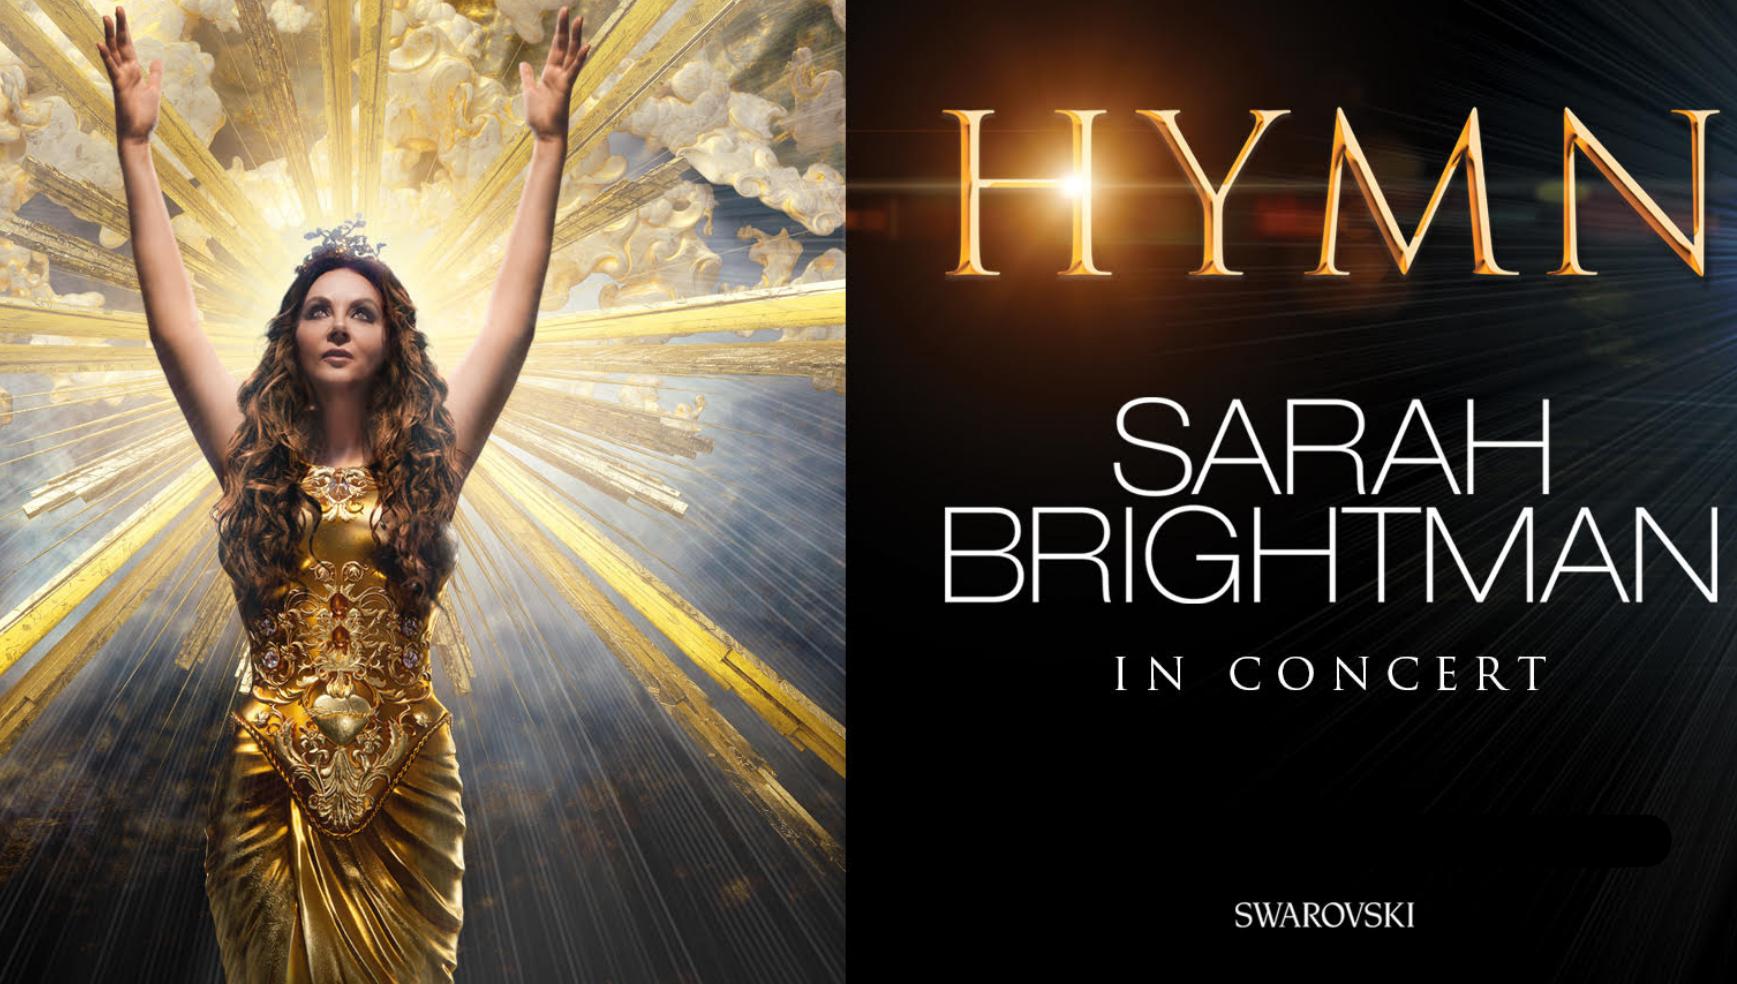 Toyota Las Vegas >> The HYMN World Tour Returns to the US in October 2020! - Sarah Brightman : Sarah Brightman